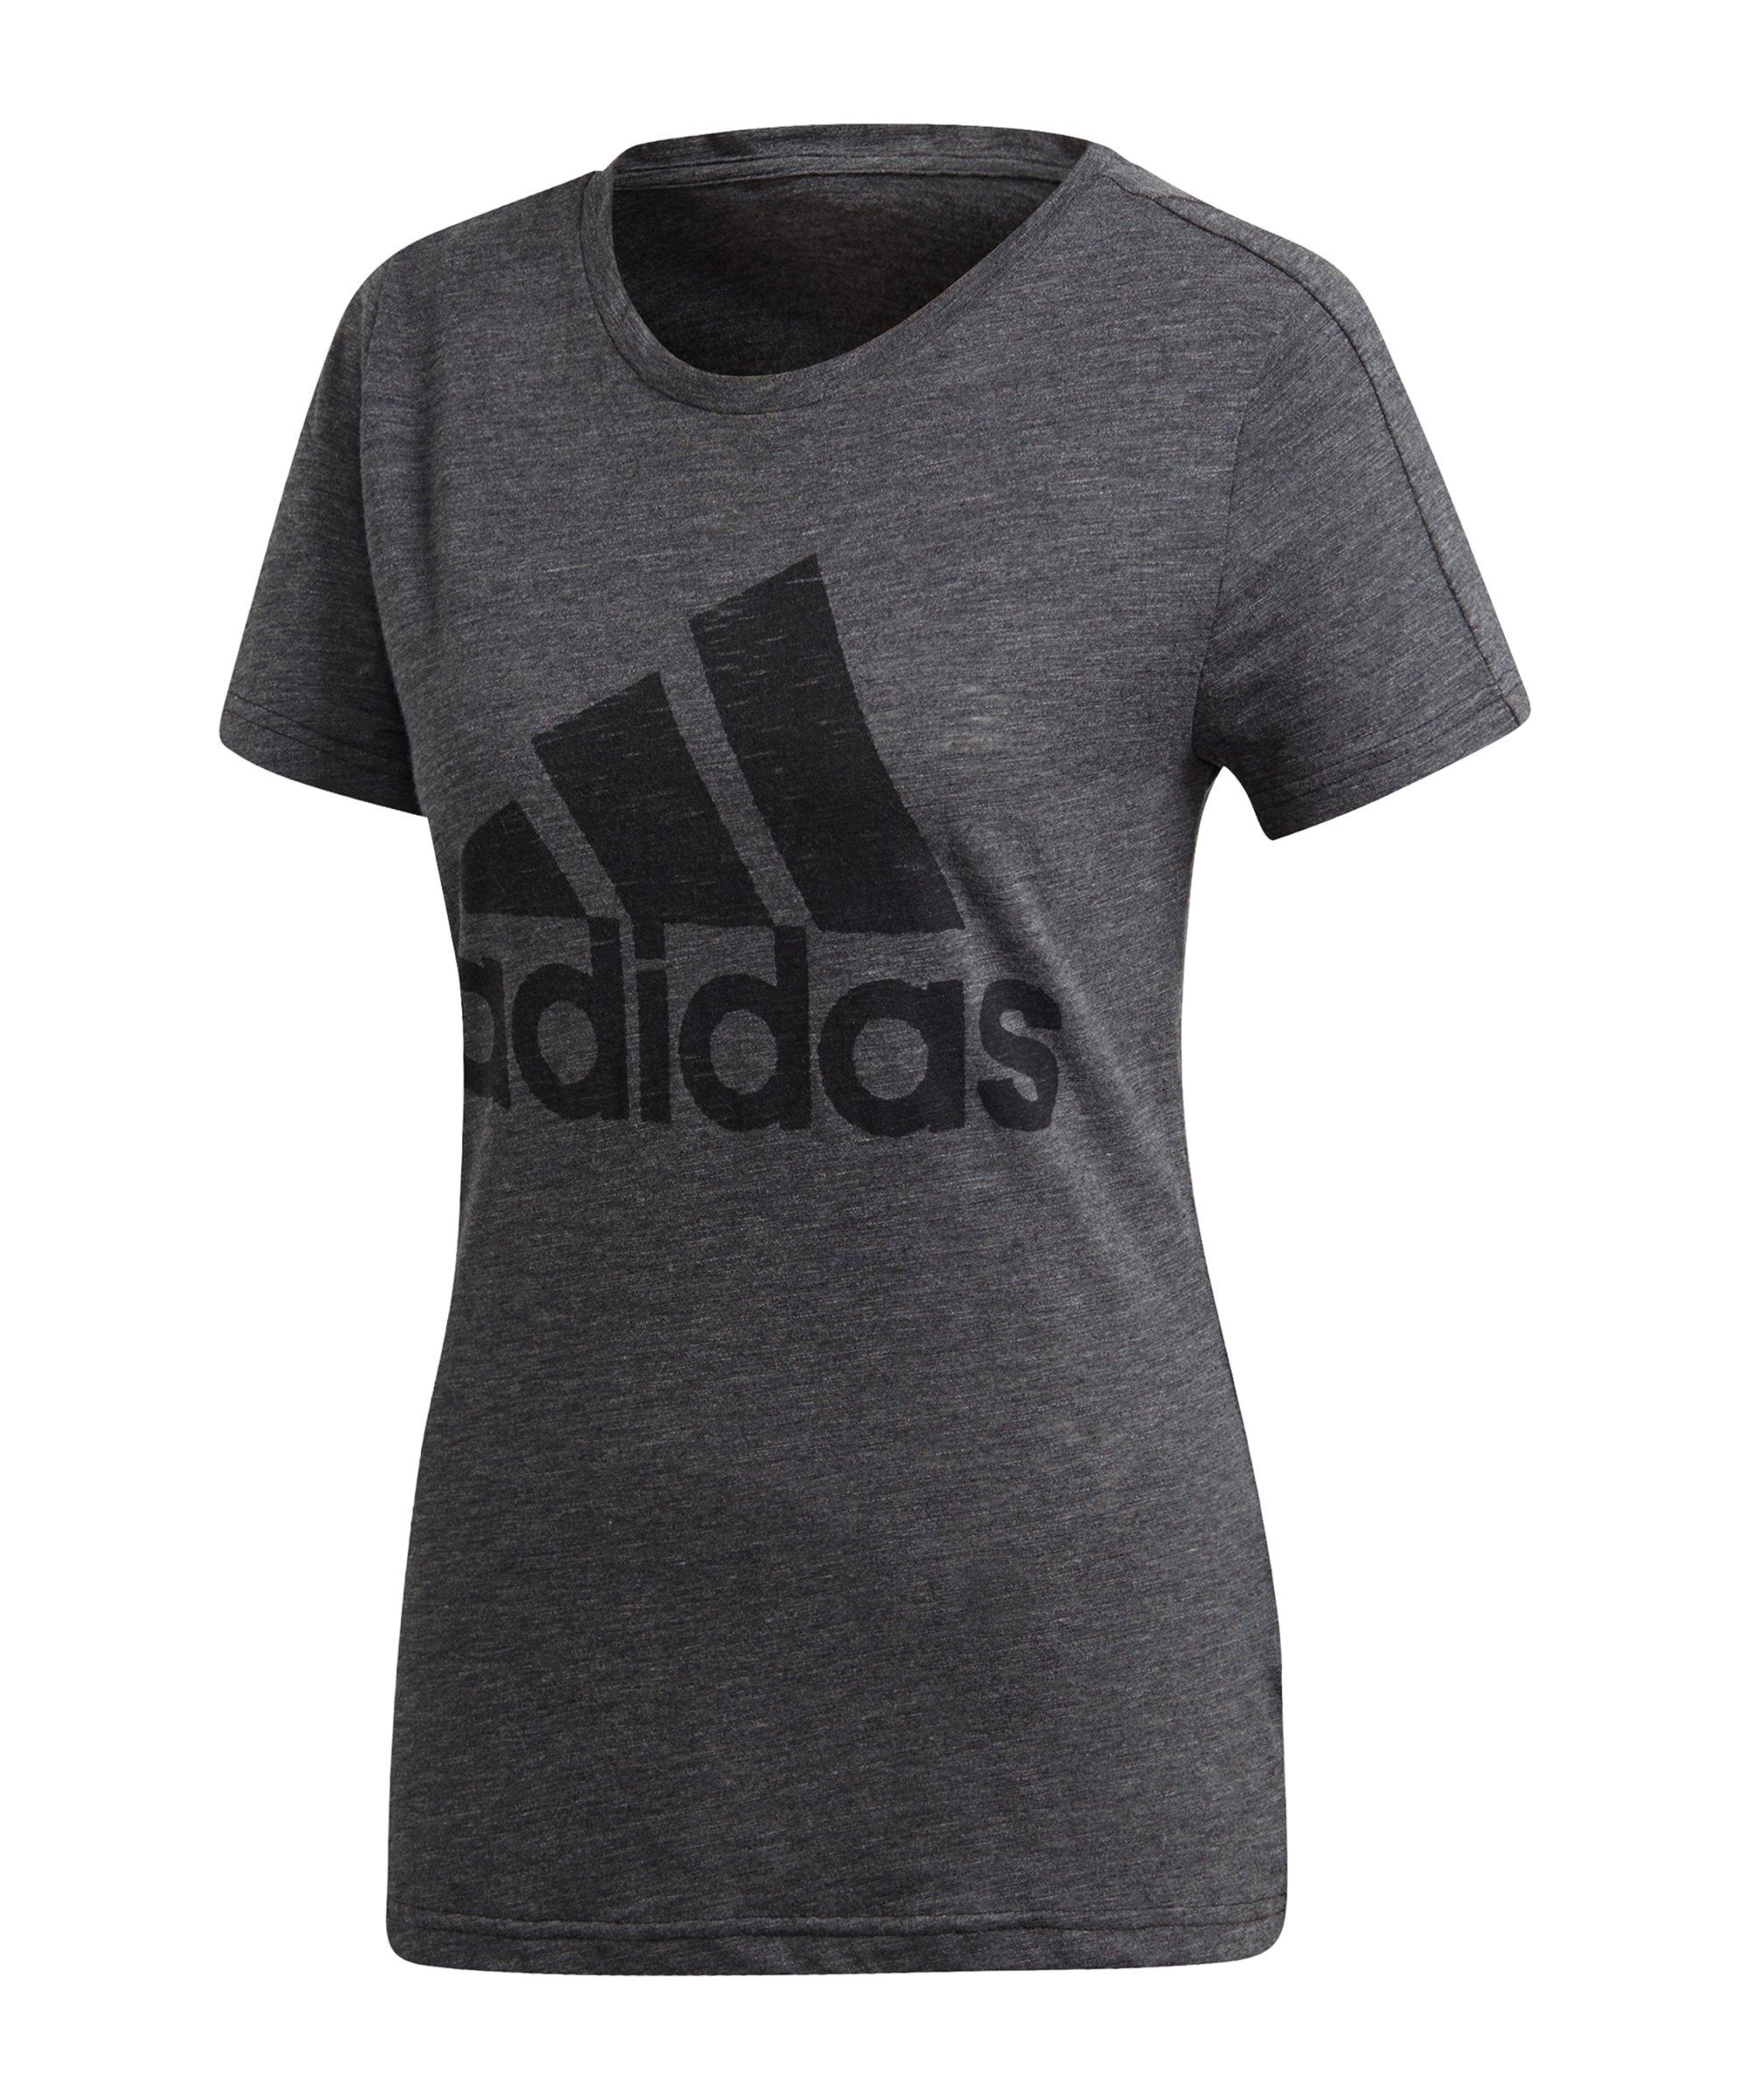 adidas Winners T-Shirt Damen Grau Schwarz - grau